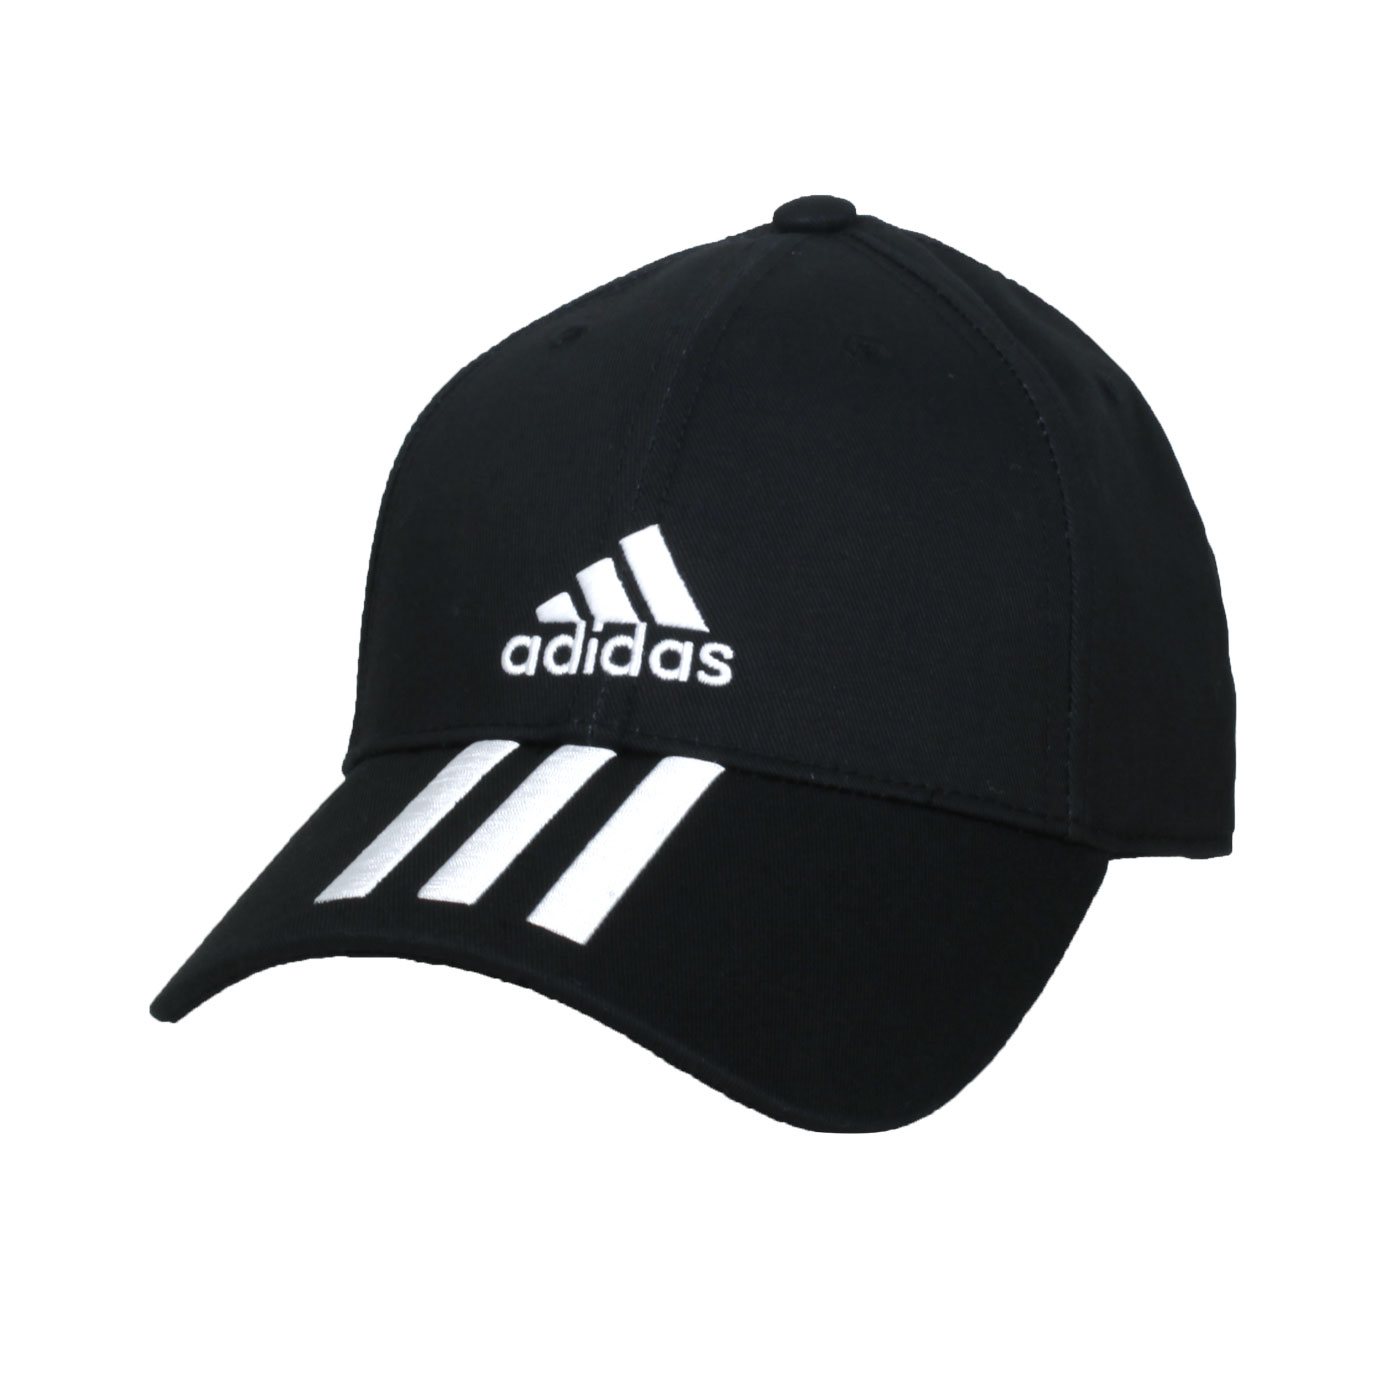 ADIDAS 帽子 DQ1073 - 黑白